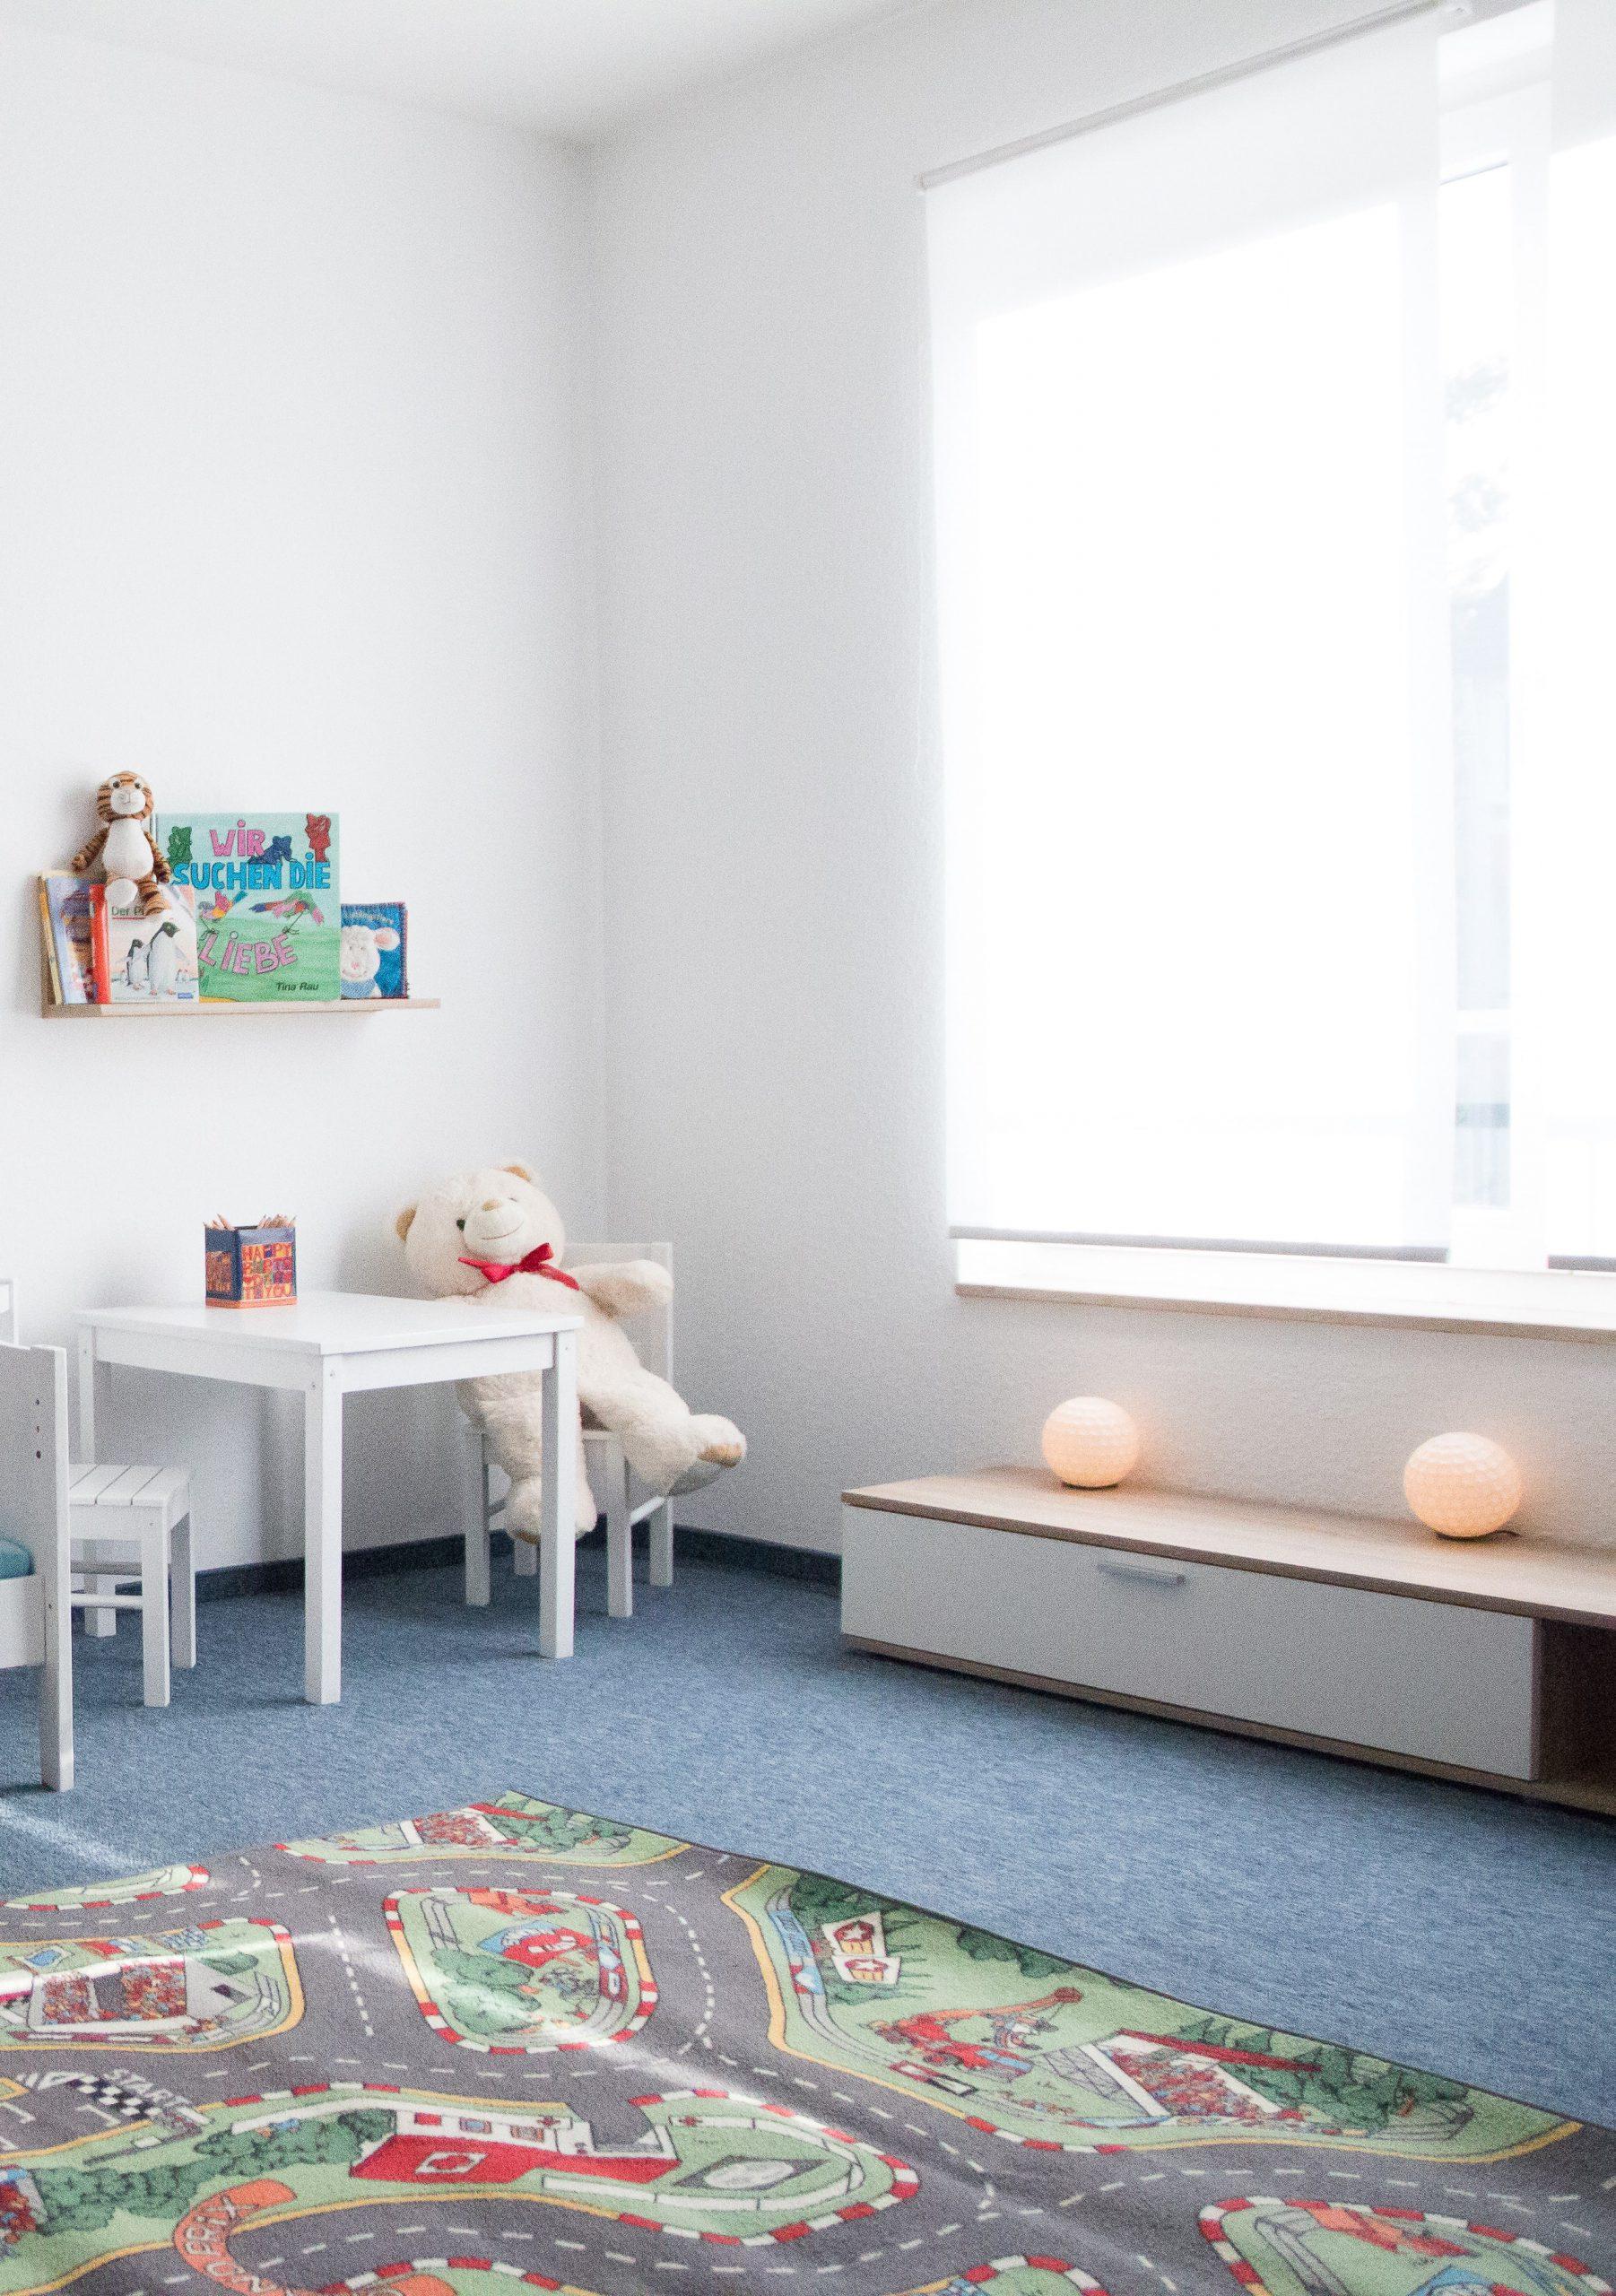 Kinderzimmer mit wenig Bugdet umgestalten